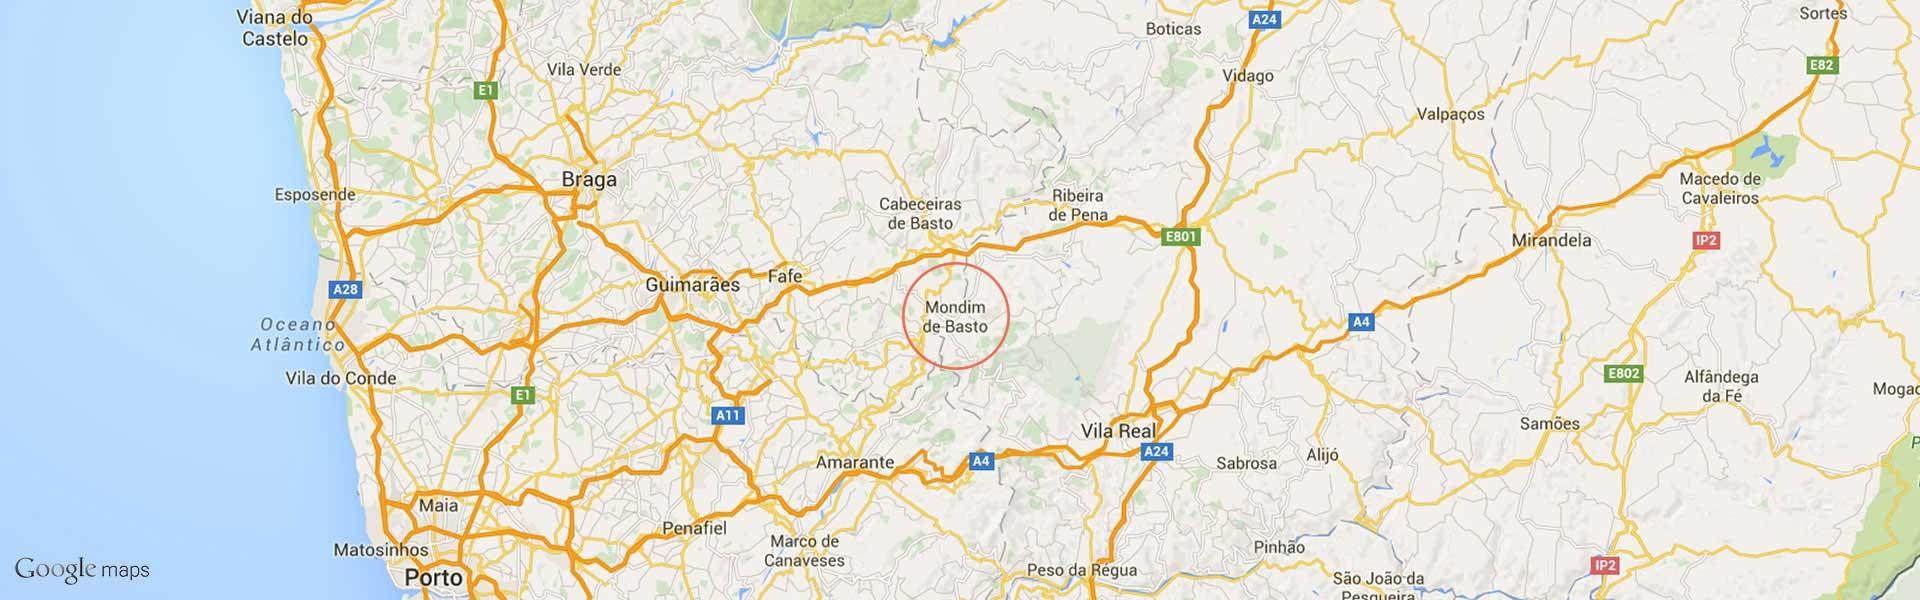 mondim_mapa